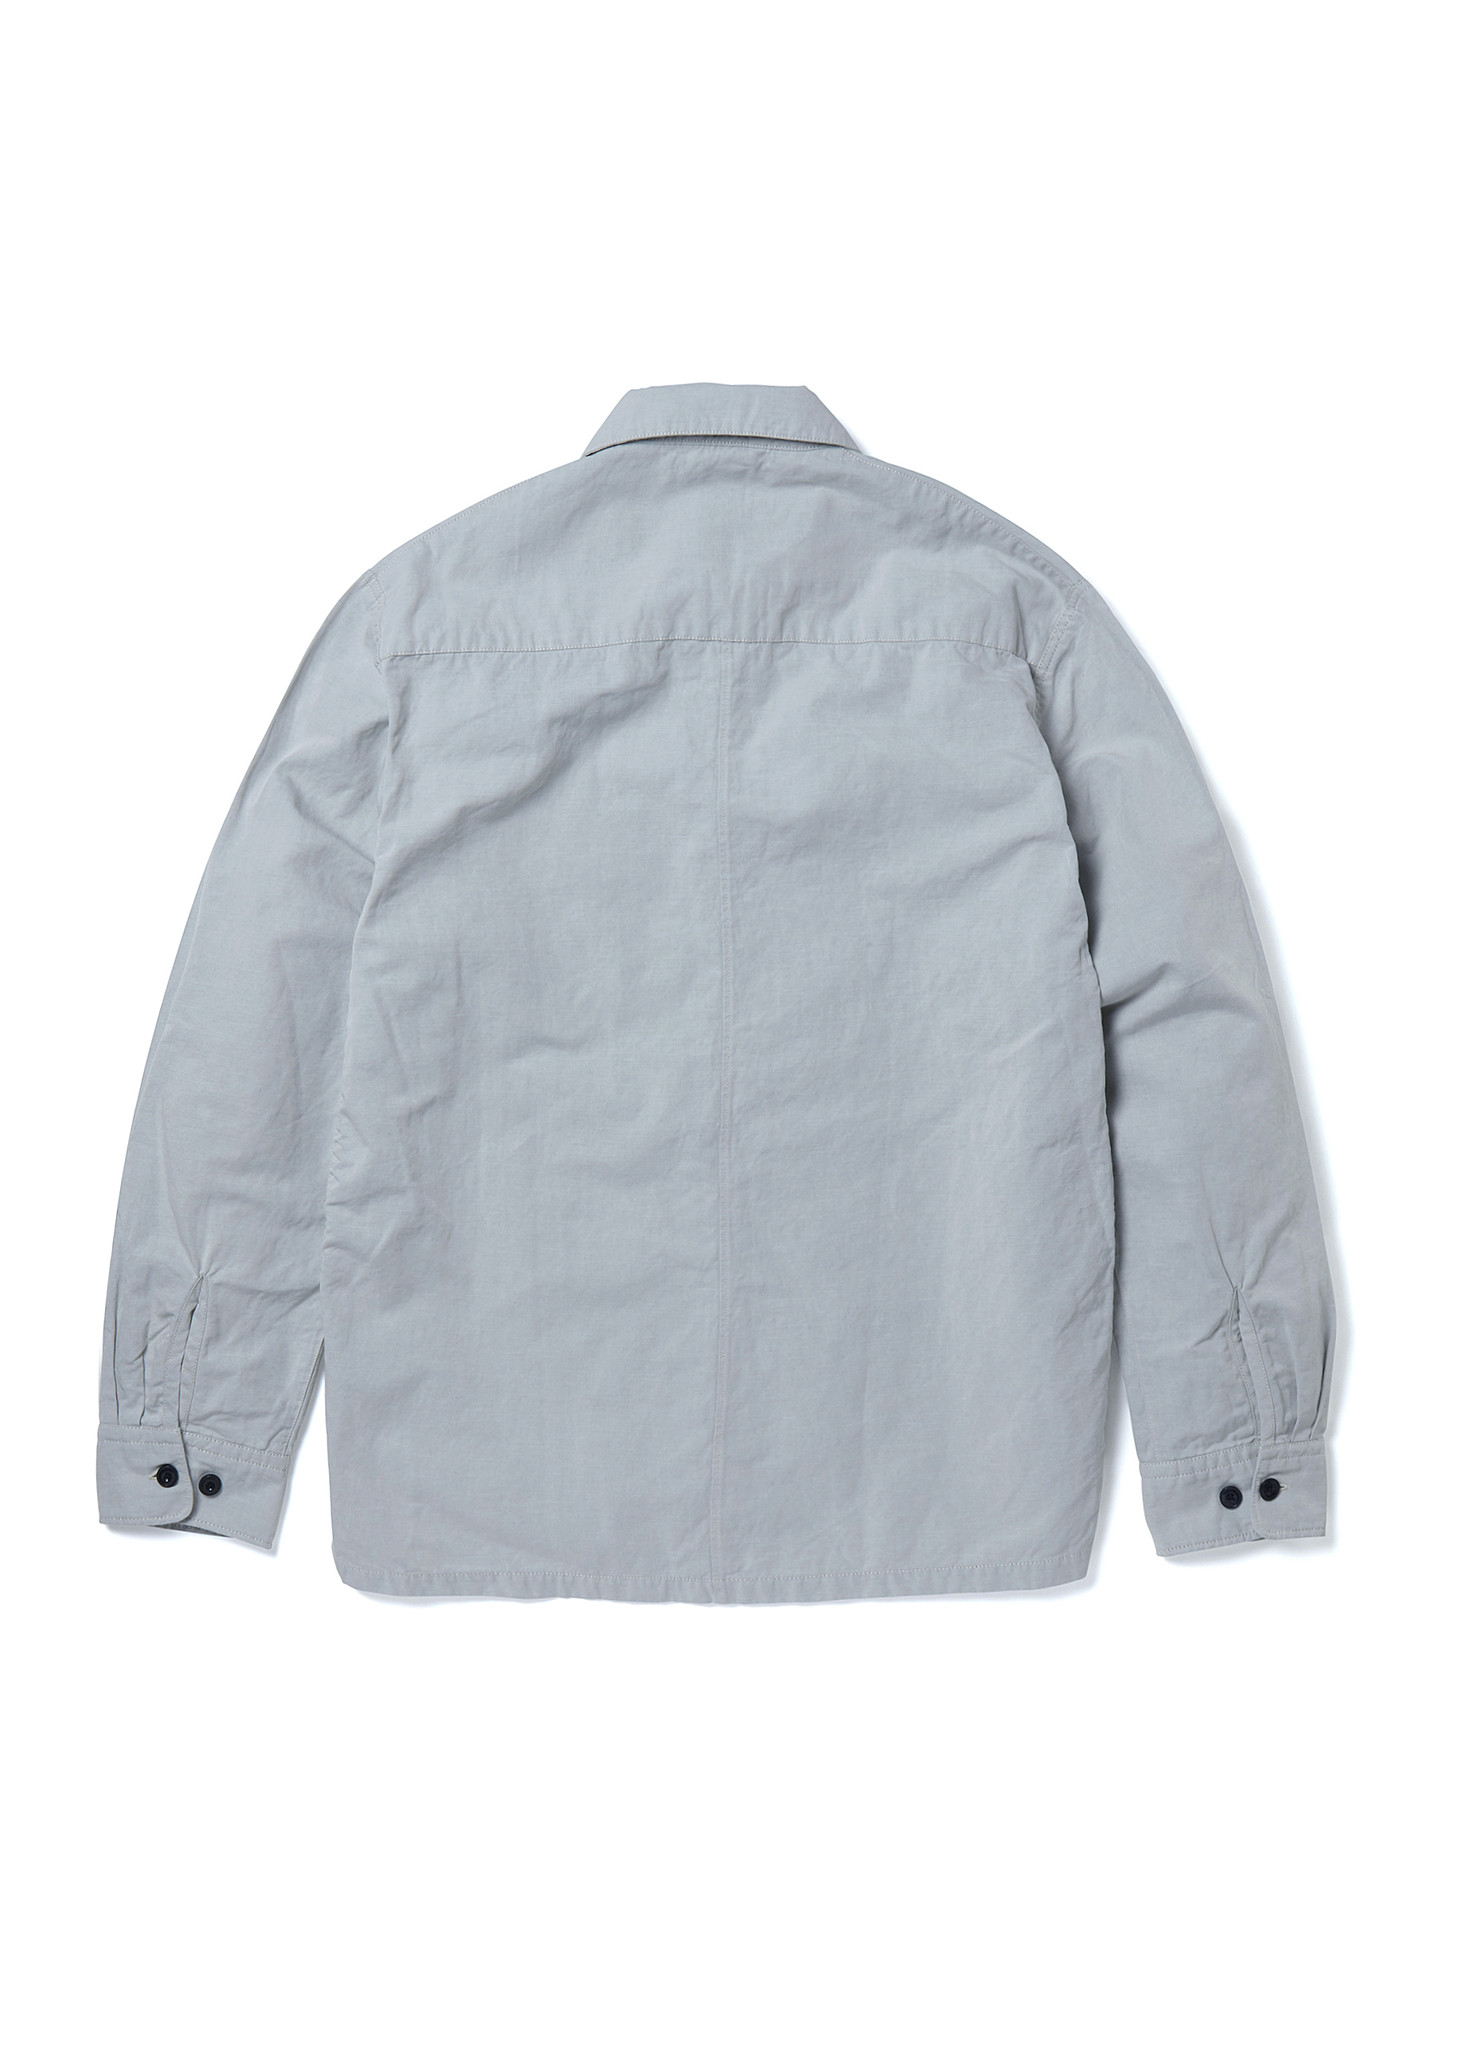 shirt1_02